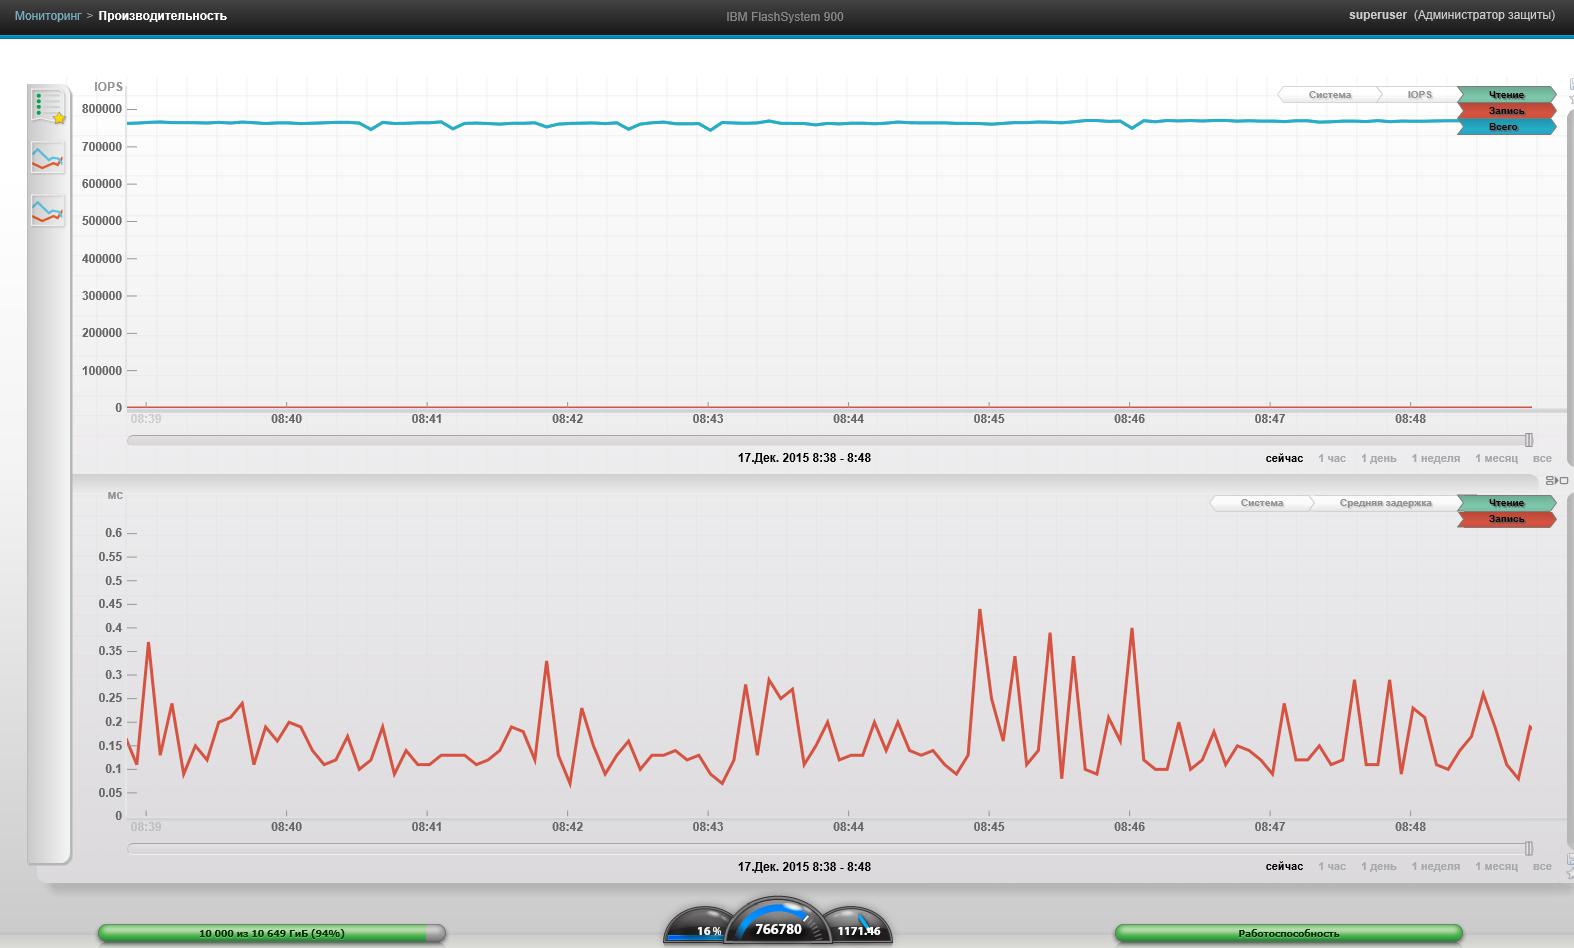 Обзор и тестирование флеш-хранилища от IBM FlashSystem 900 - 18